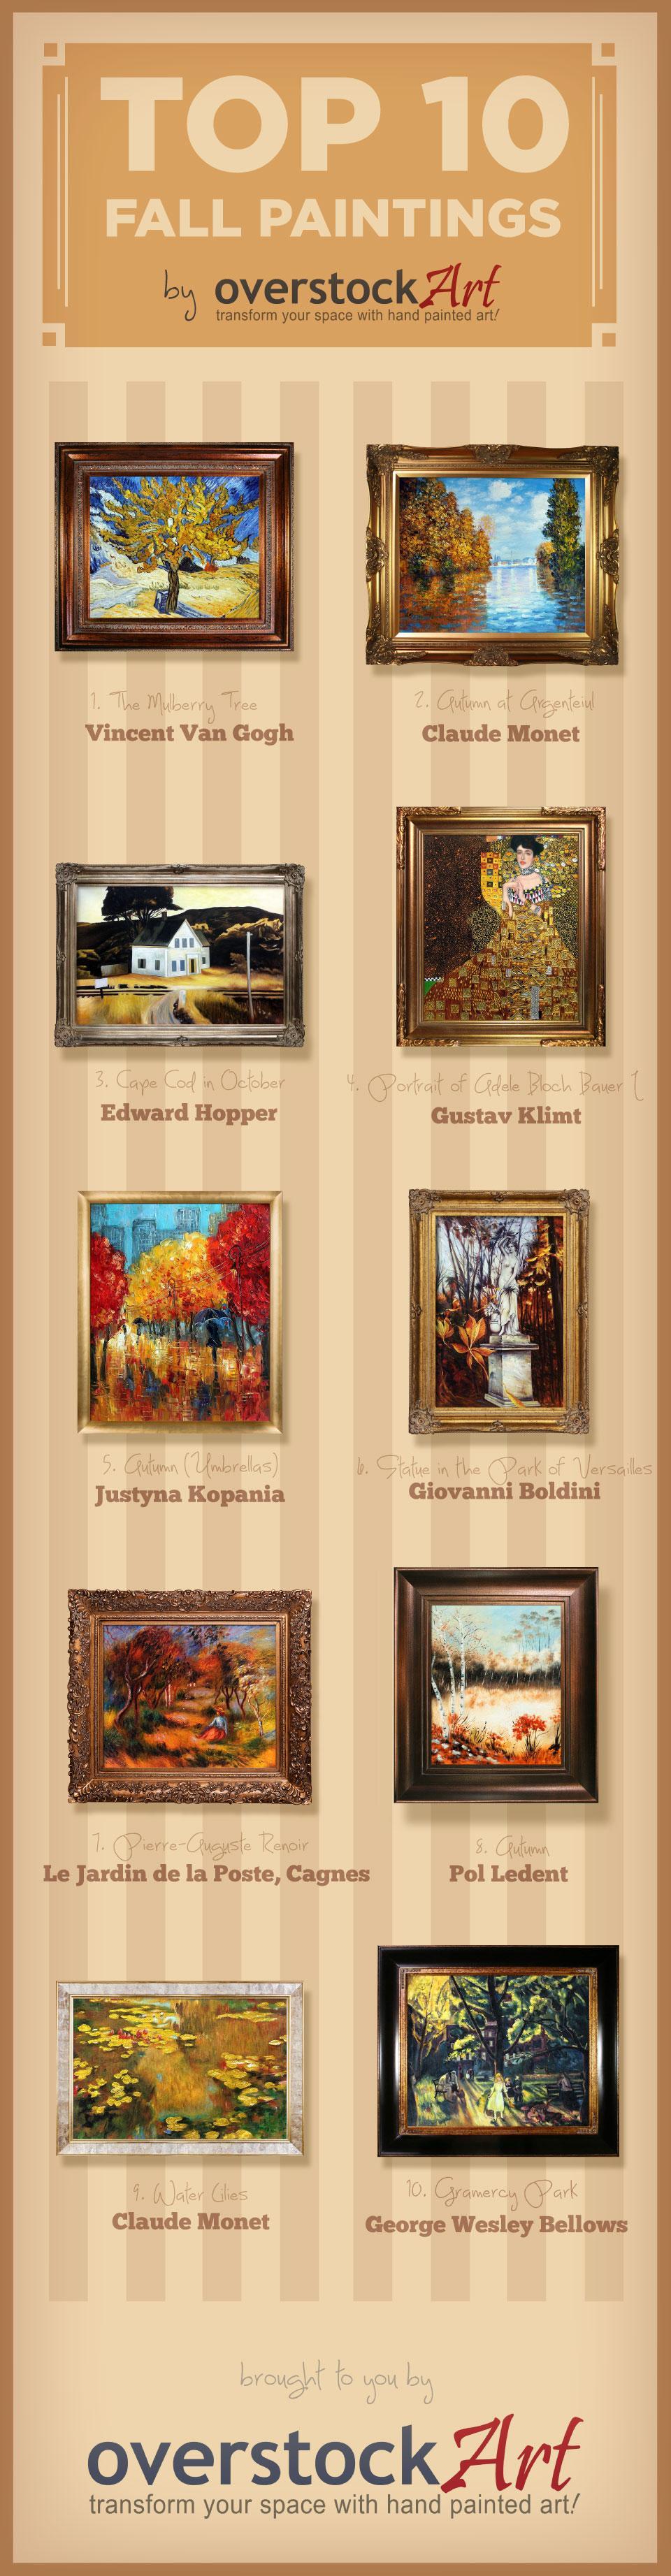 Fall 2015 Top 10 Paintings